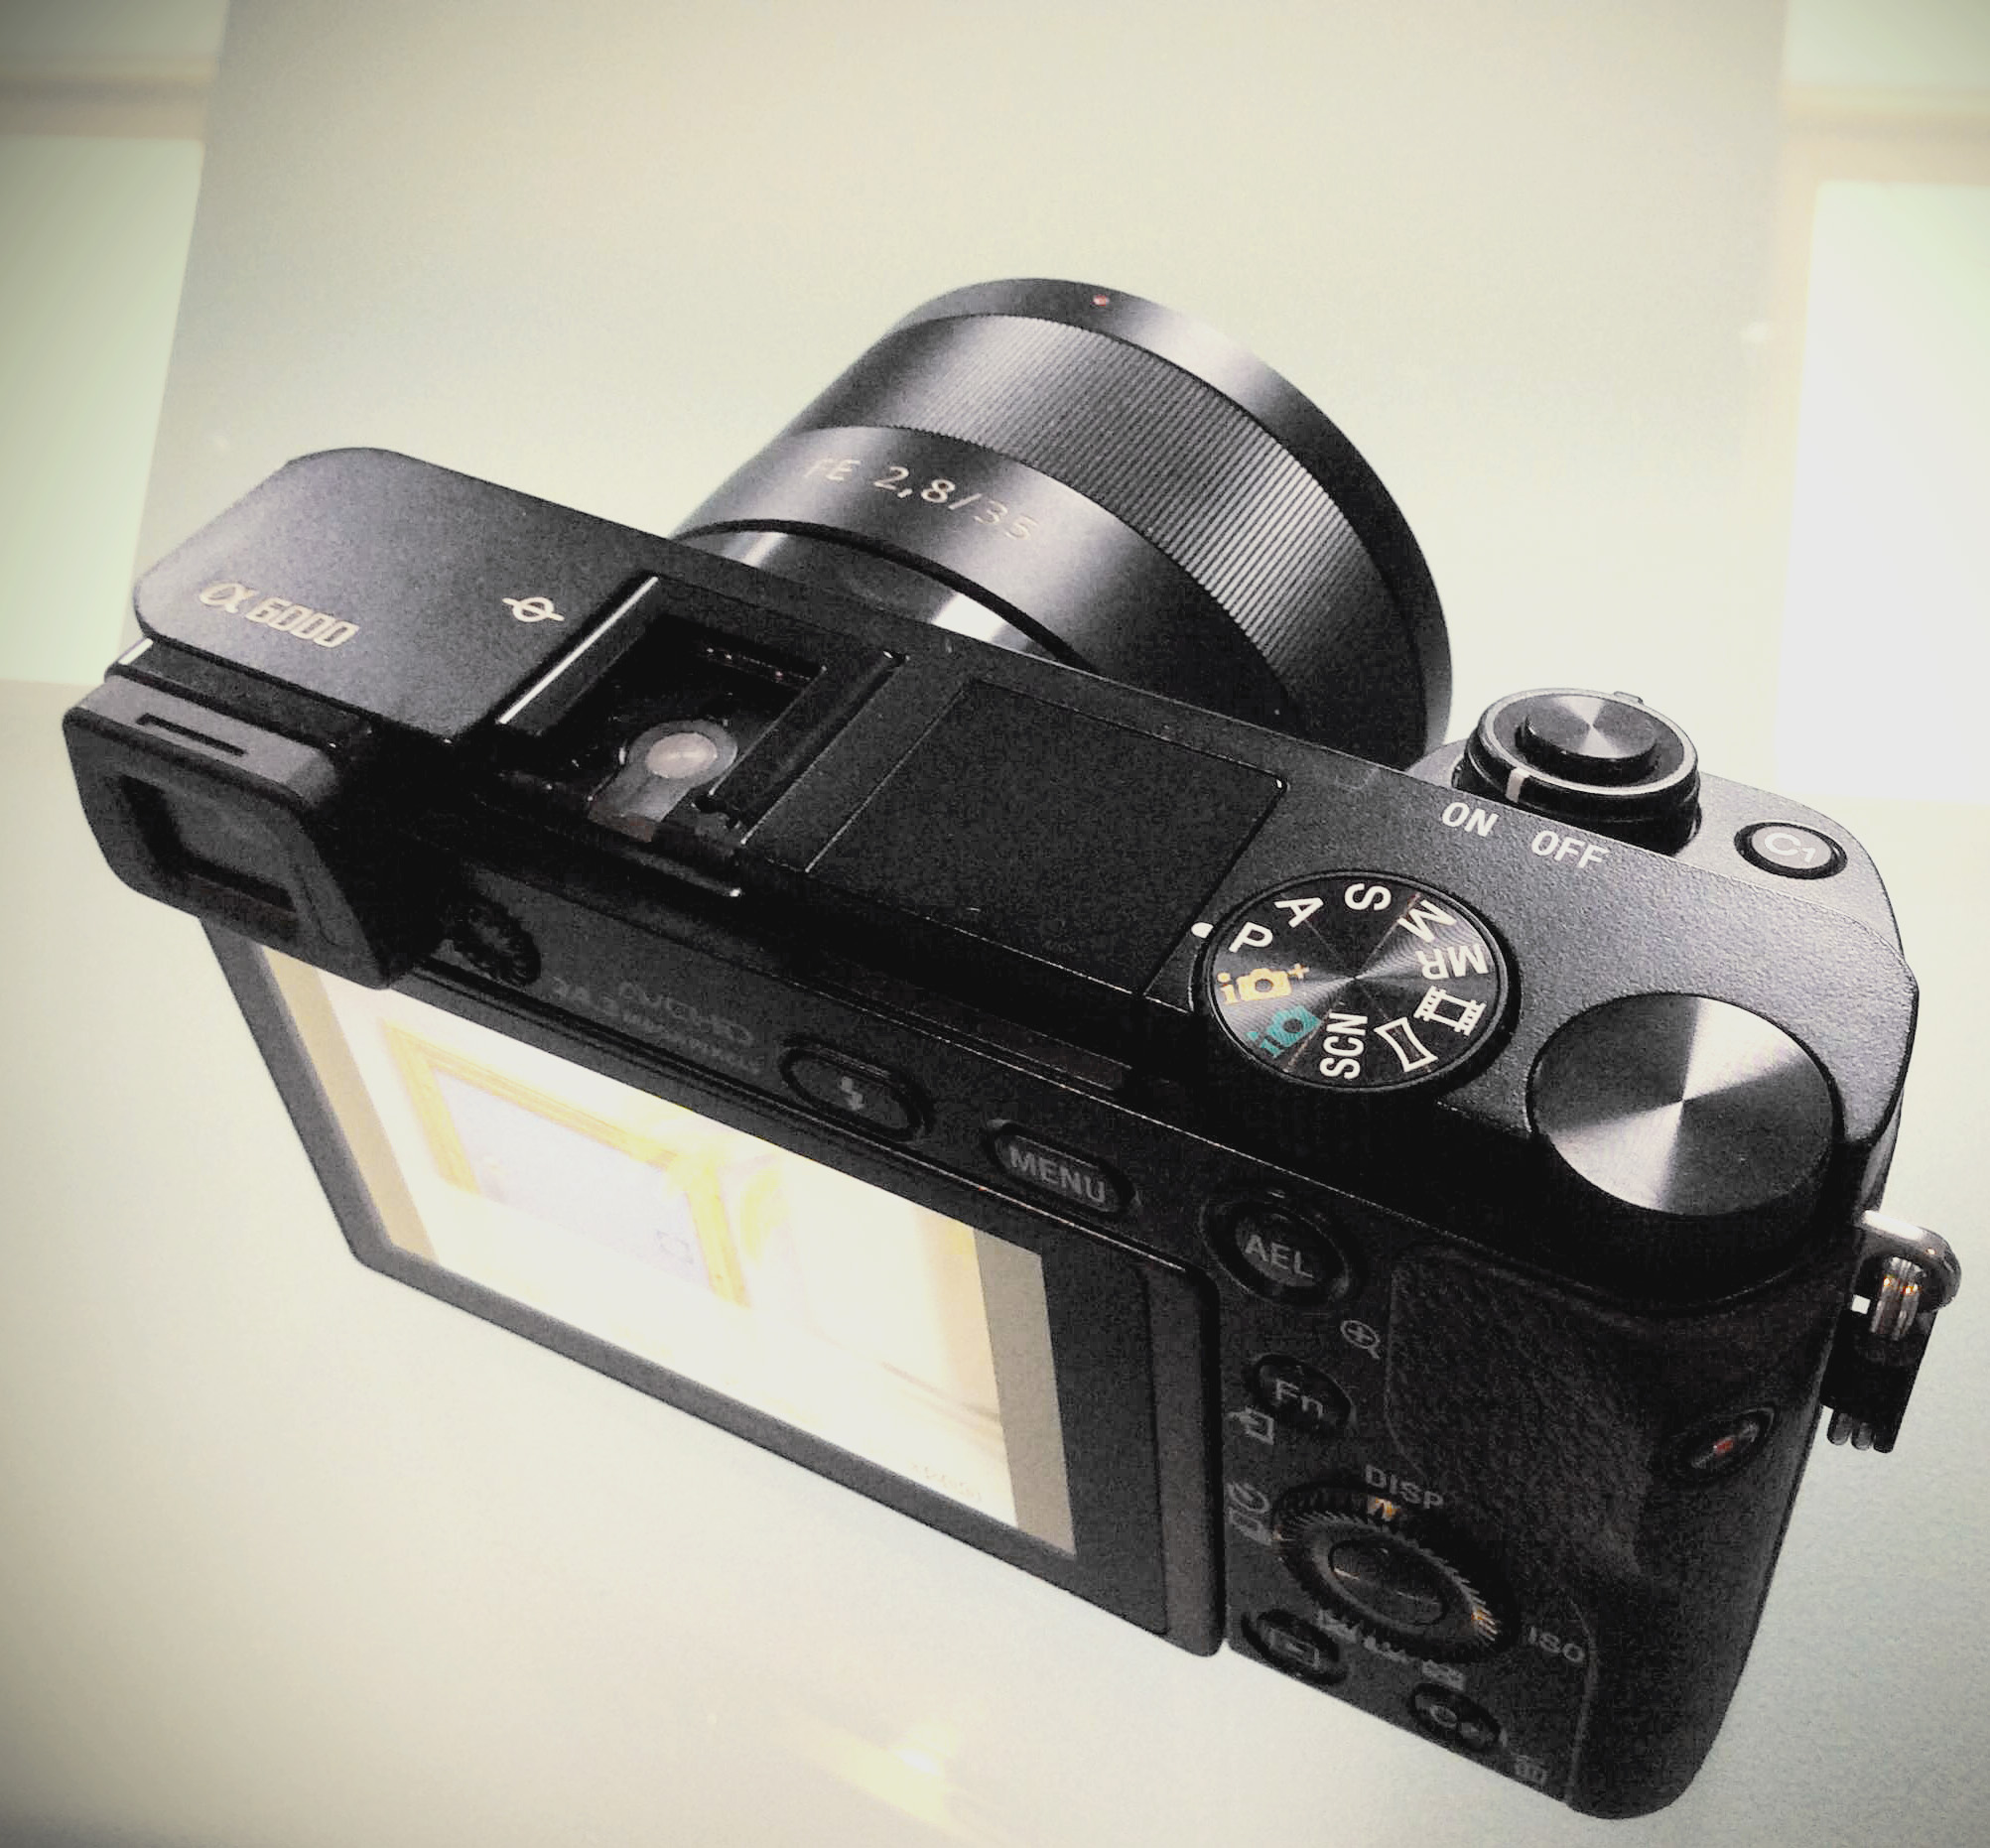 Sony a6000,  Sony FE 35mm f2.8 ZA Carl Zeiss Sonnar T* Lens